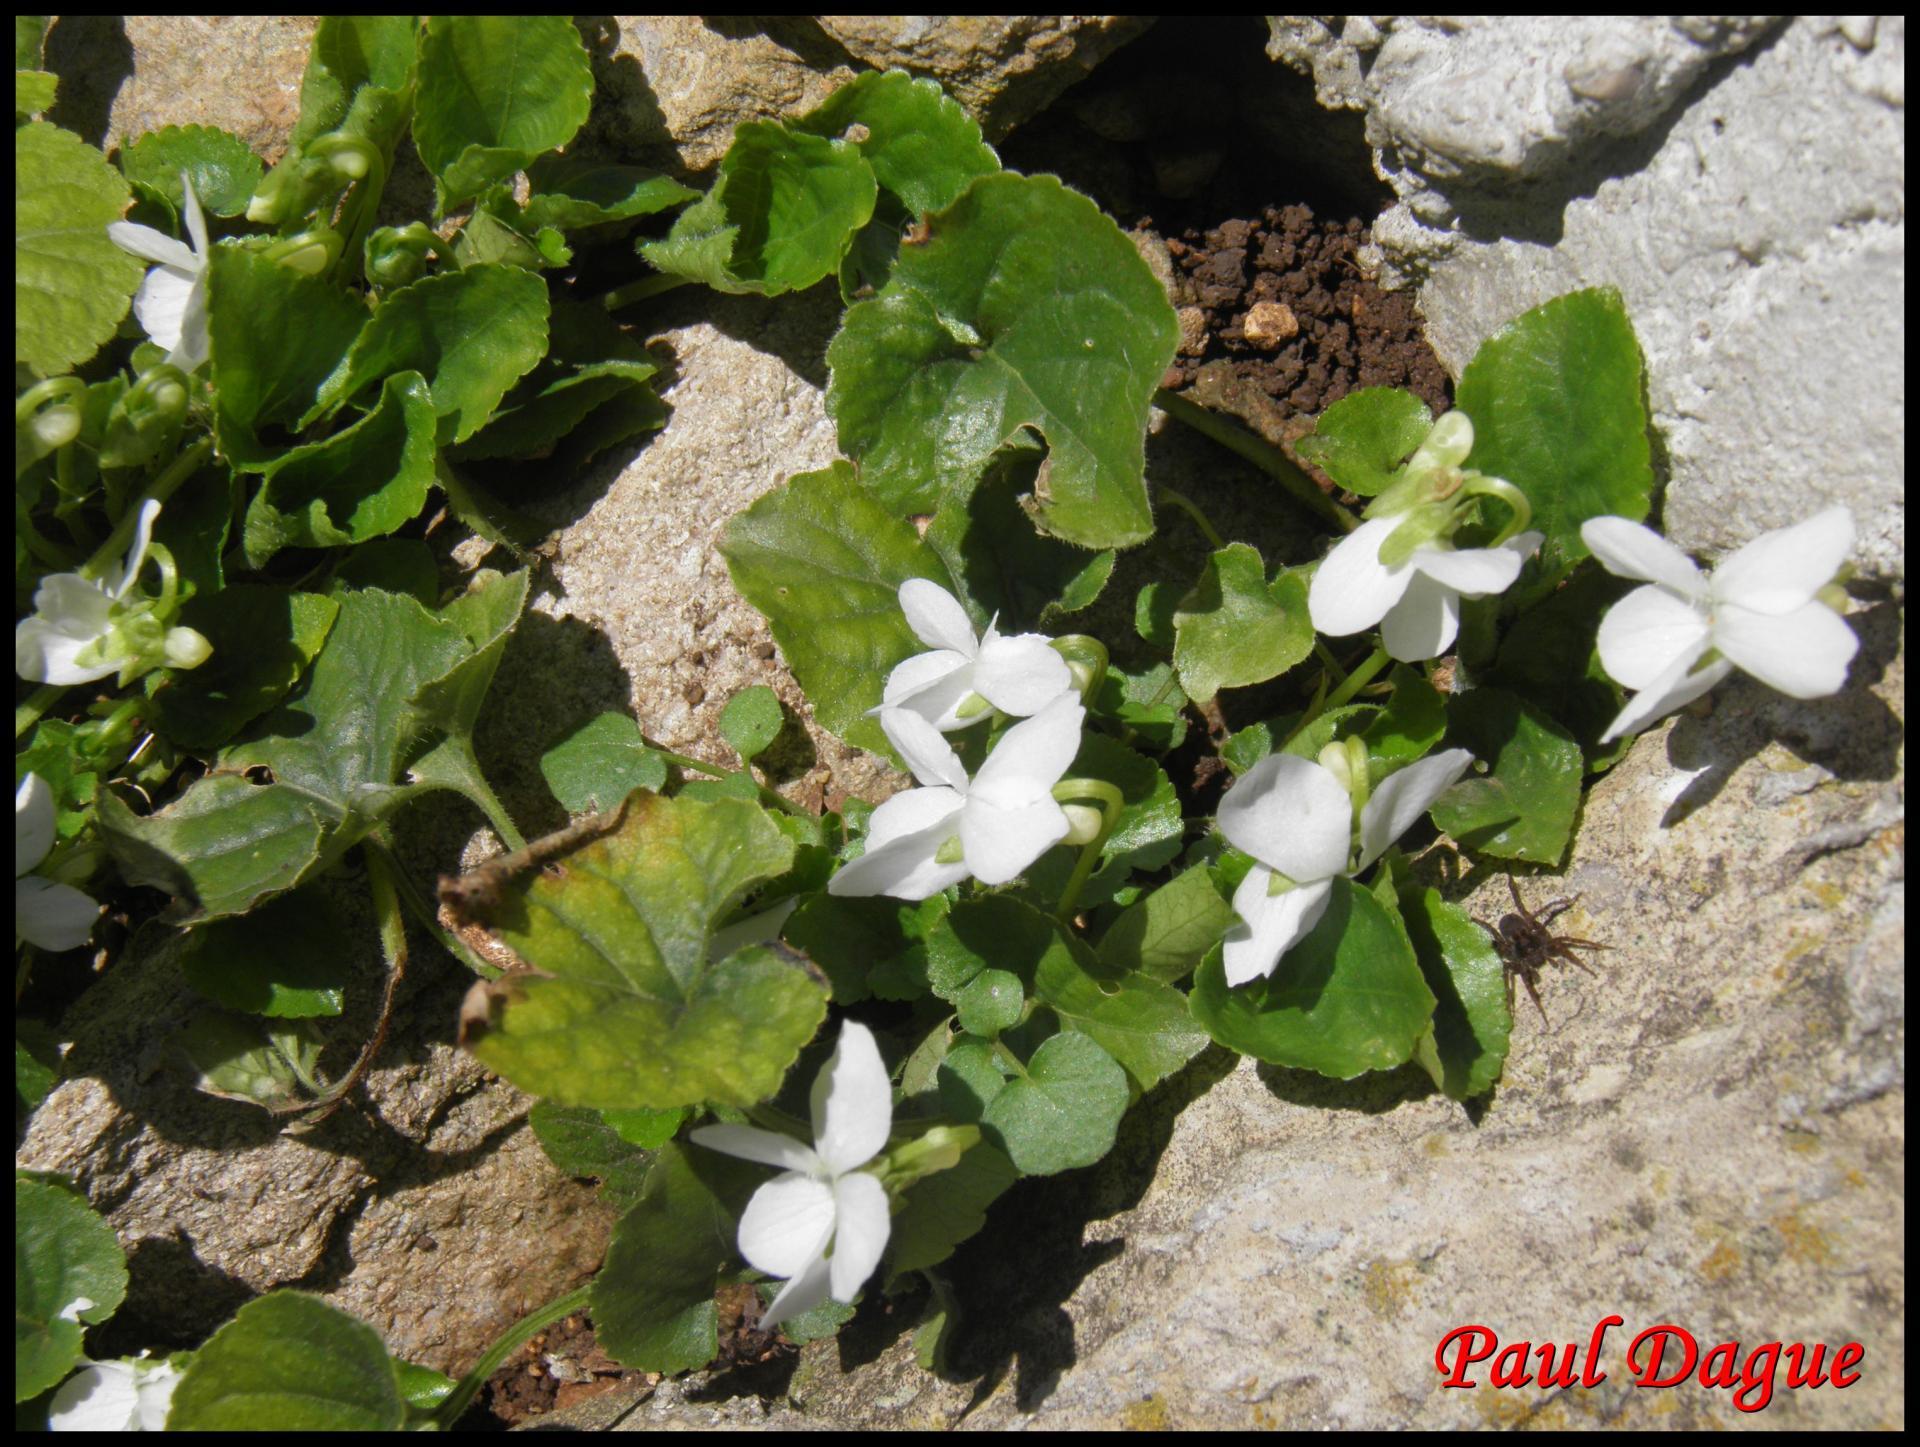 181 violette blanche viola alba violacee